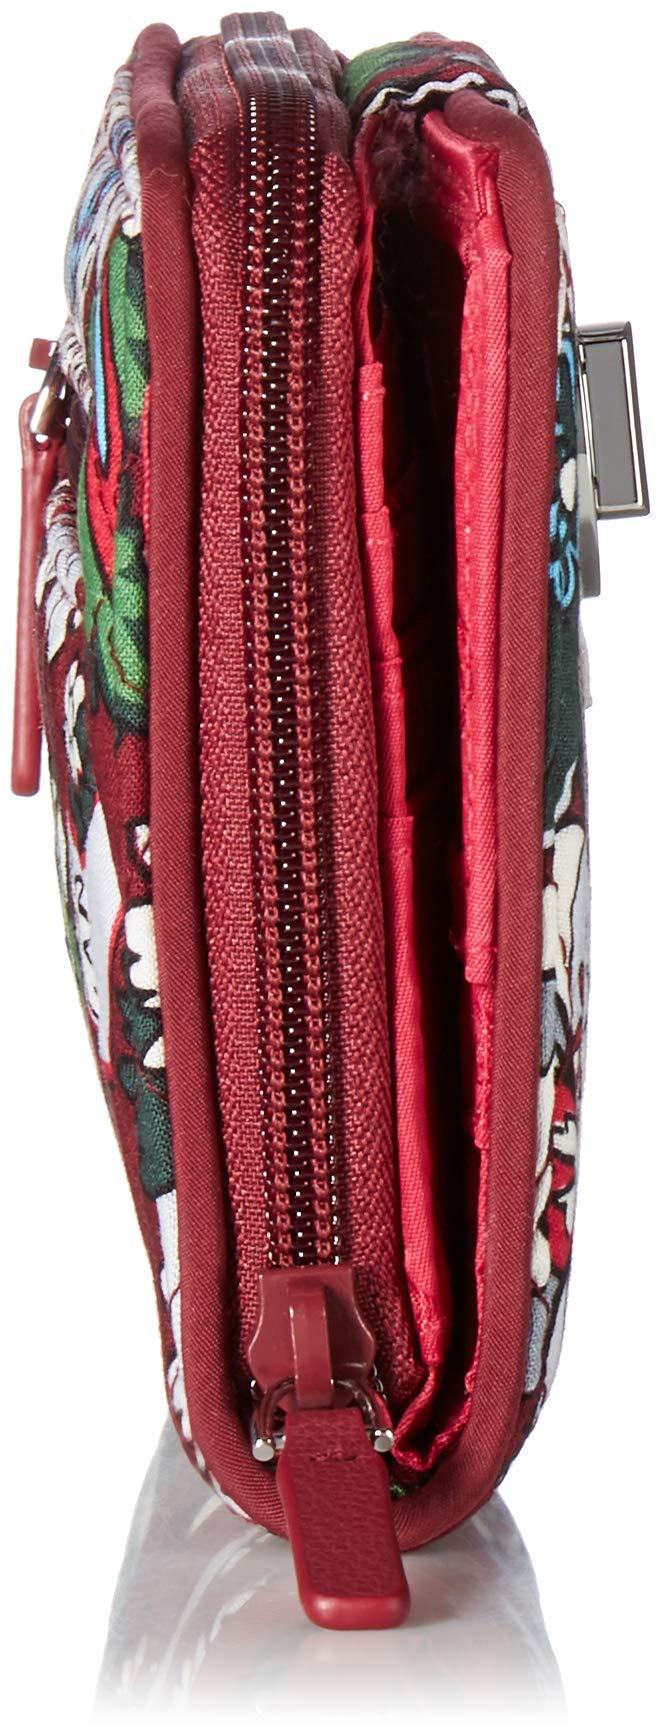 Vera Bradley RFID Turnlock Wallet,  Signature Cotton, One Size by Vera Bradley (Image #4)